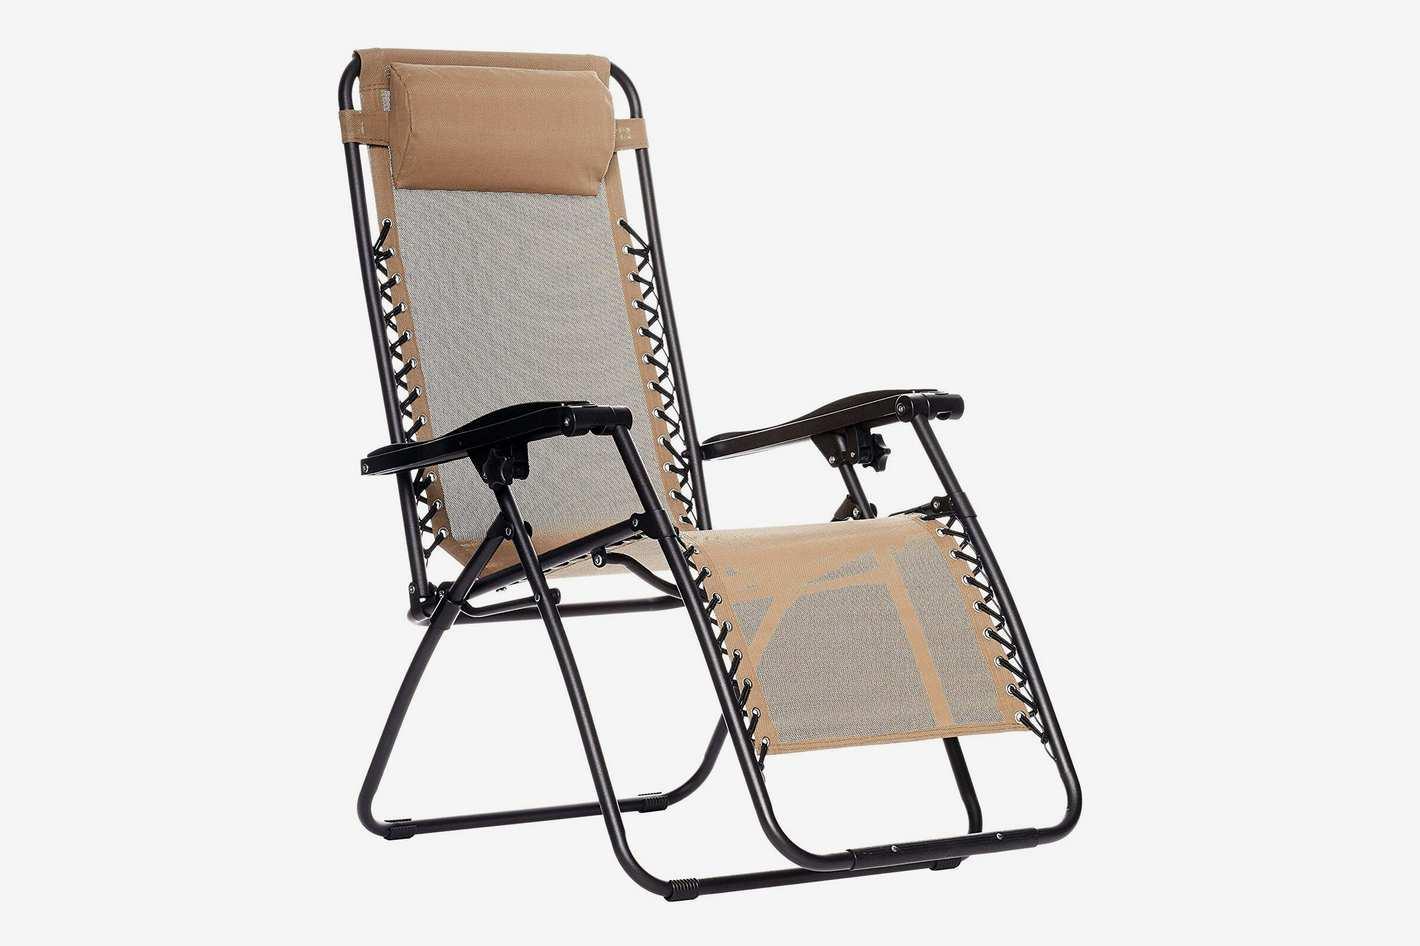 AmazonBasics Zero-Gravity Chair - Beige